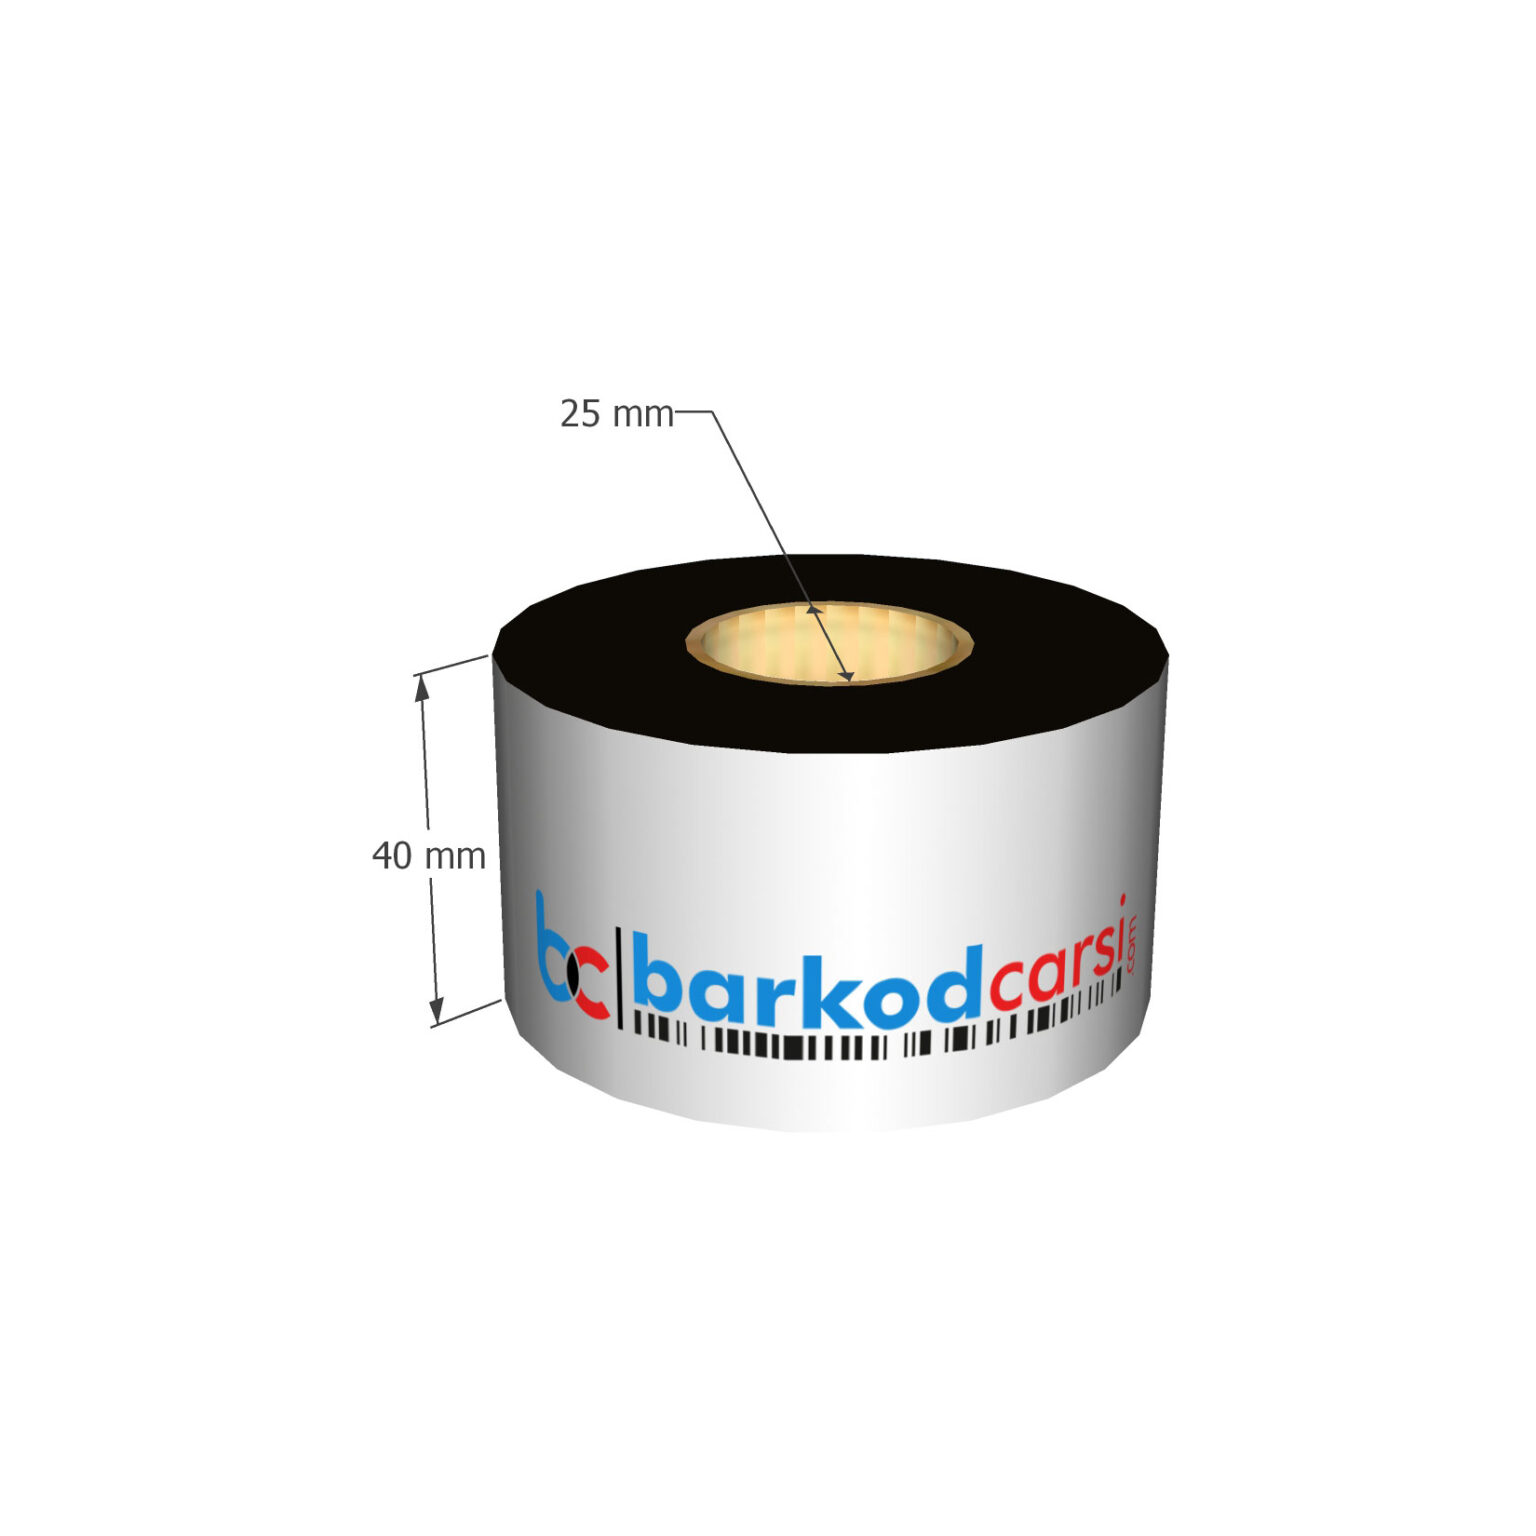 40x300 mt Wax / Wax-Resin / Resin / Hot-Foil Ribon Çeşitleri By BarkodCarsi.com